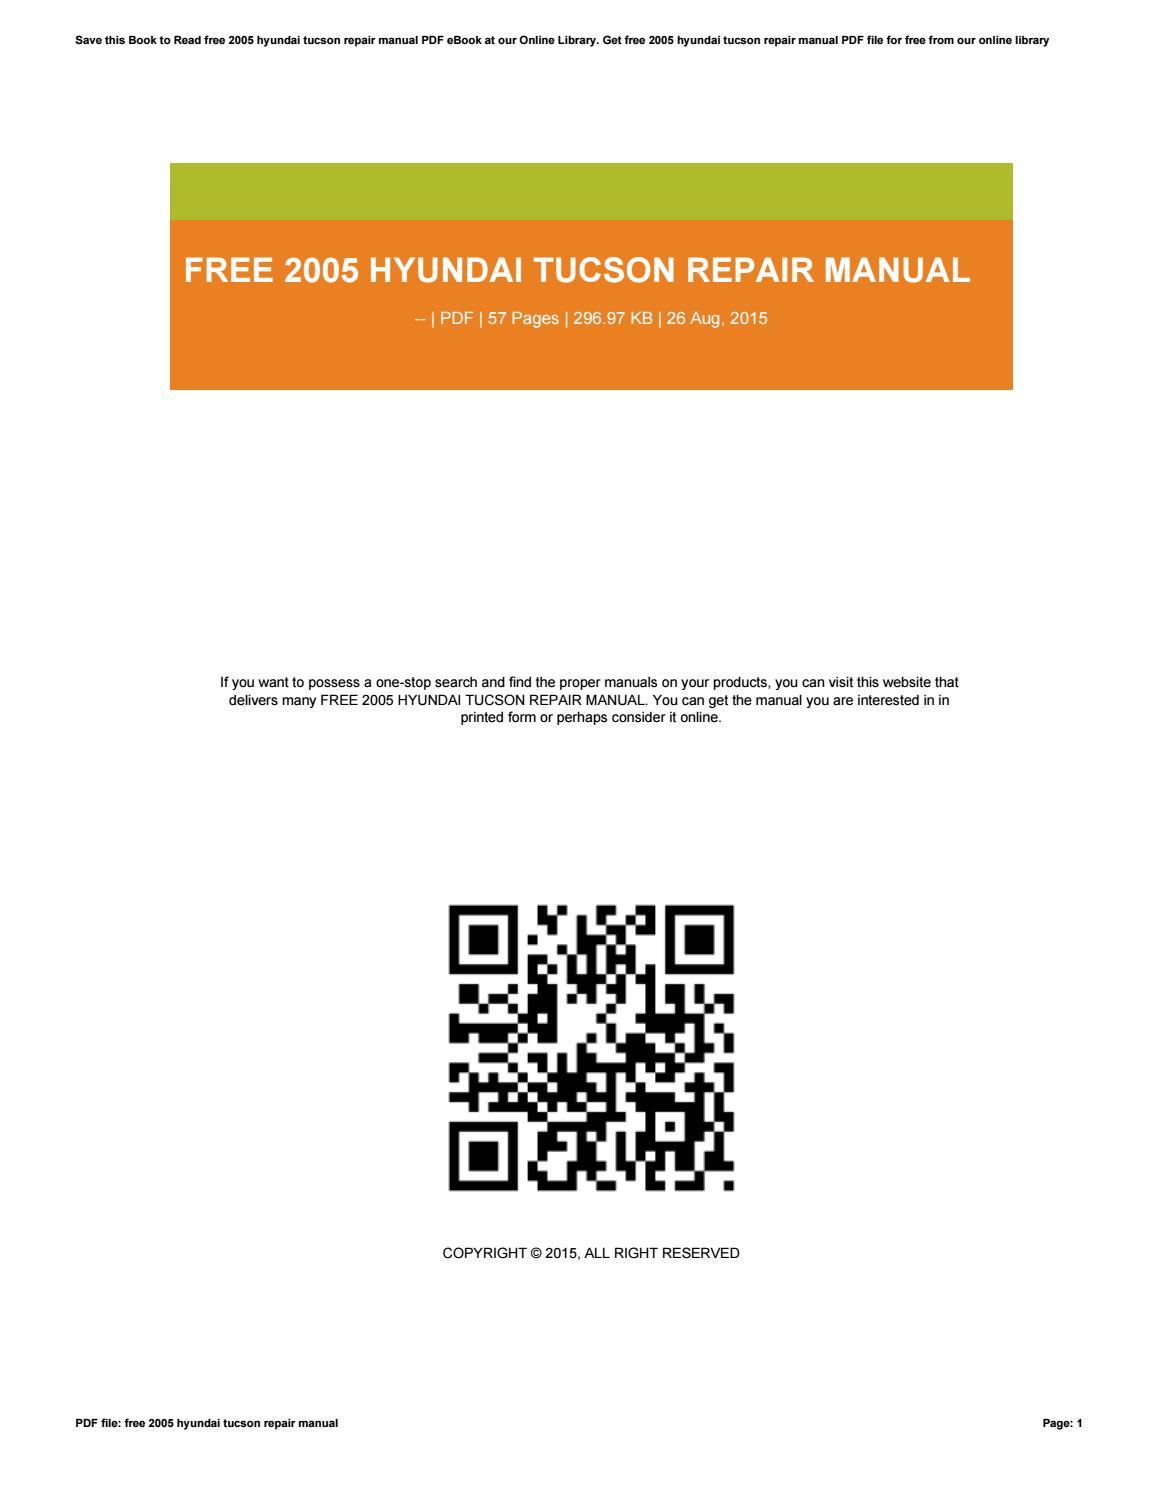 Free 2005 Hyundai Tucson Repair Manual By As49 Issuu